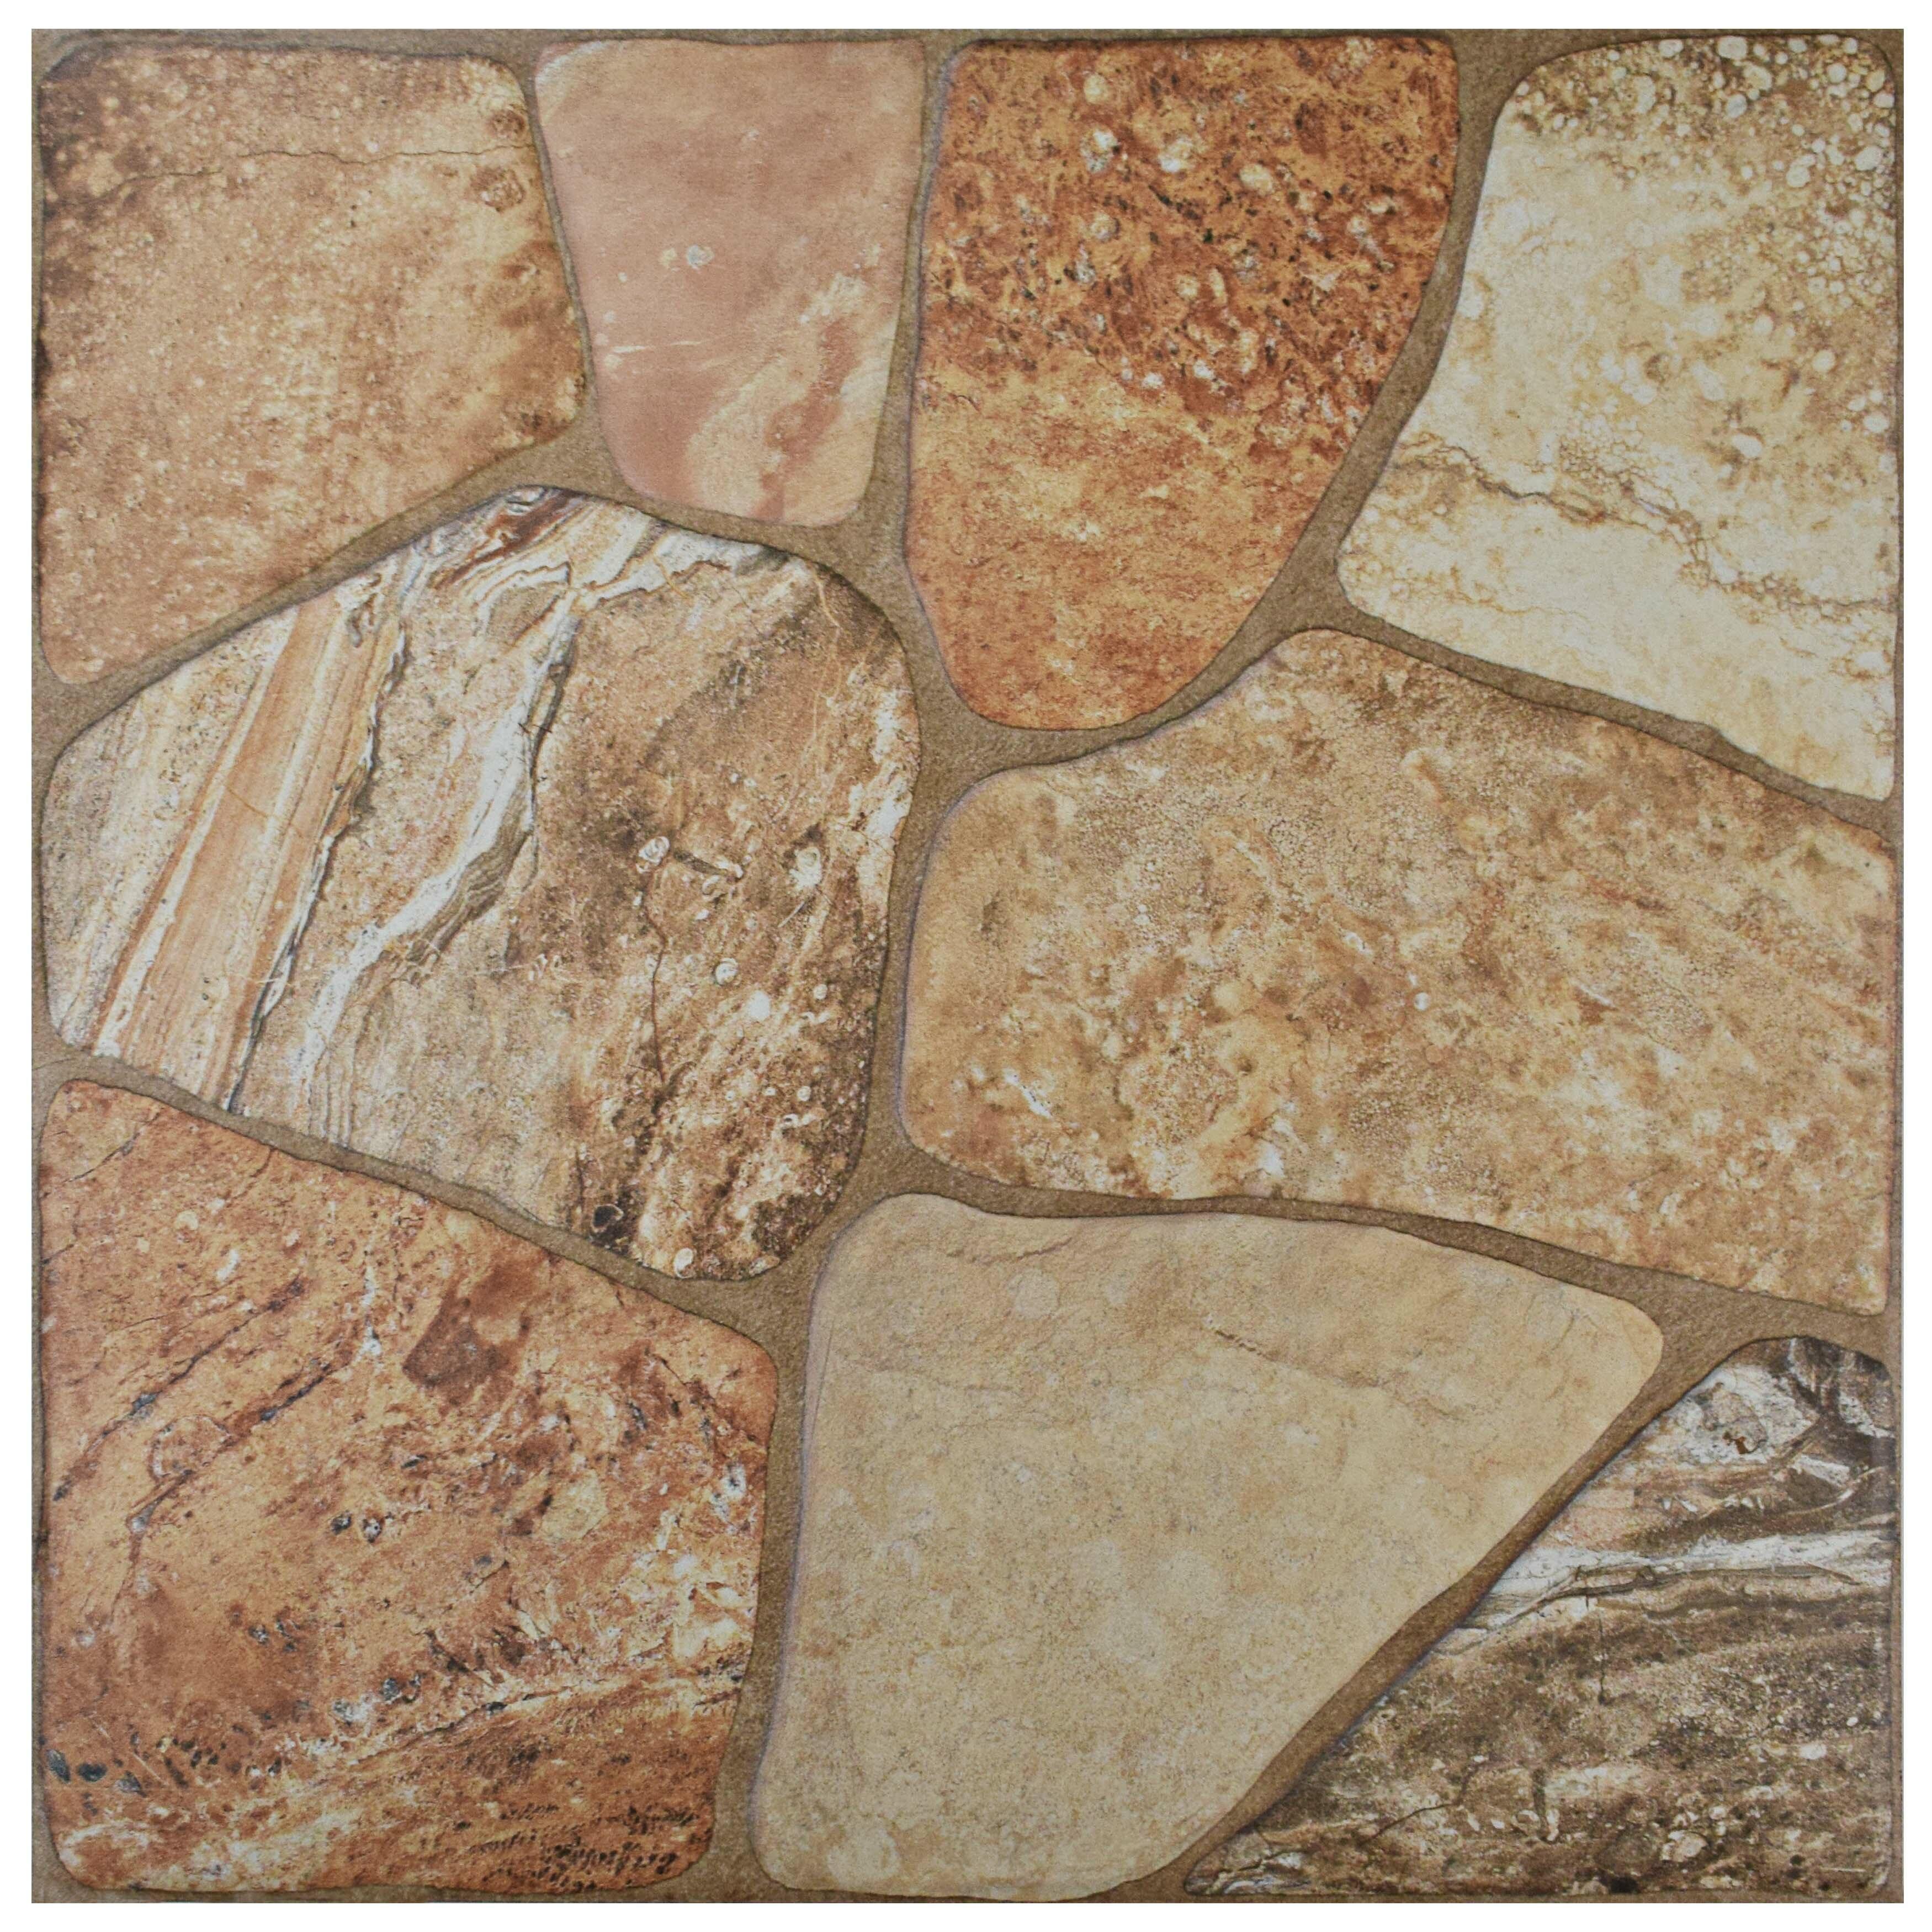 Elitetile marseille 1775 x 1775 ceramic field tile in beige elitetile marseille 1775 x 1775 ceramic field tile in beige reviews wayfair dailygadgetfo Images